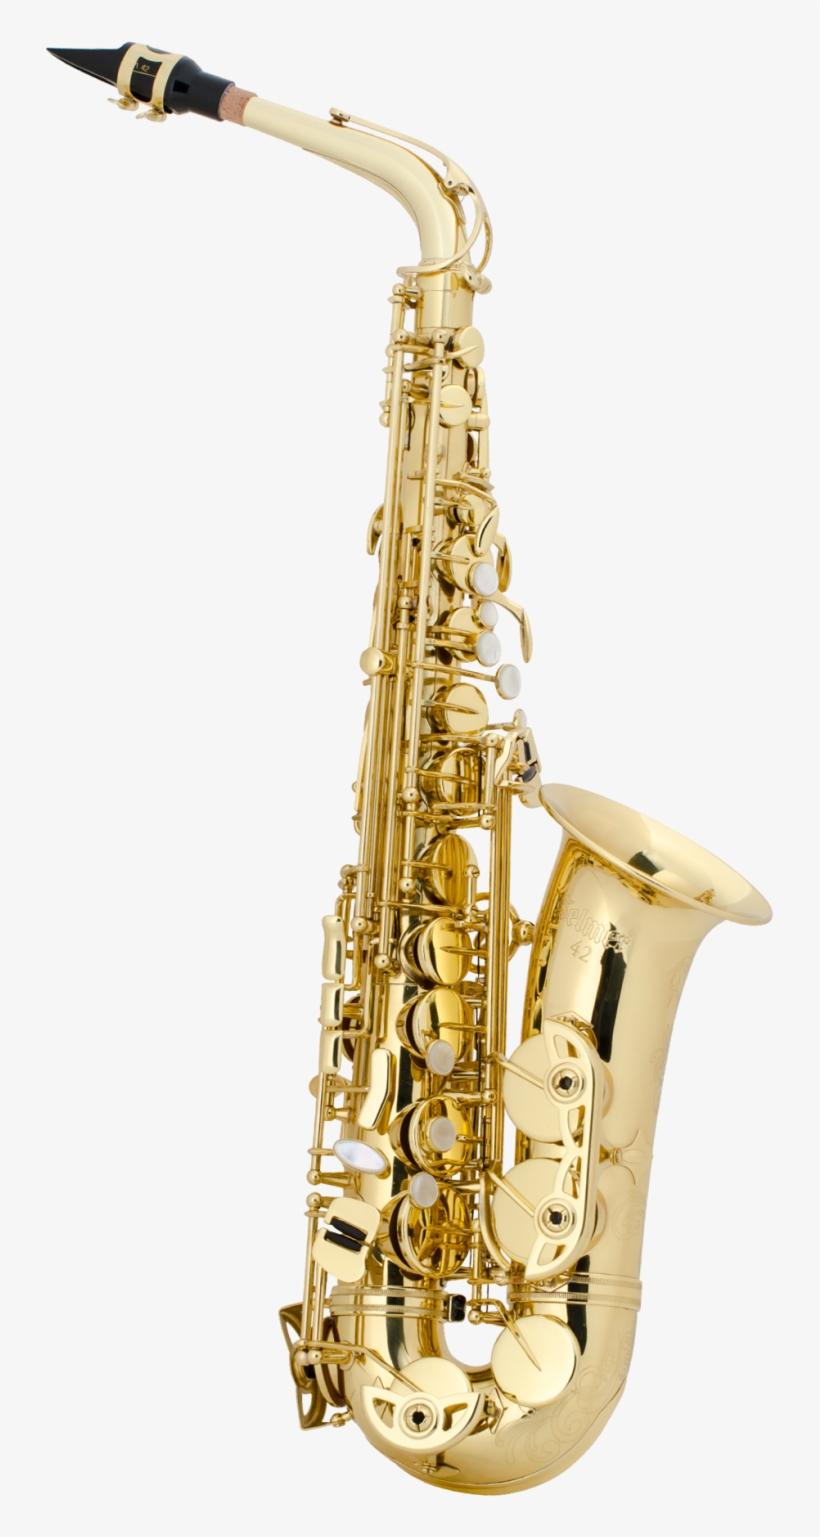 Alto-sax - Henri Selmer Paris As42 Alto Saxophone, transparent png #8453555